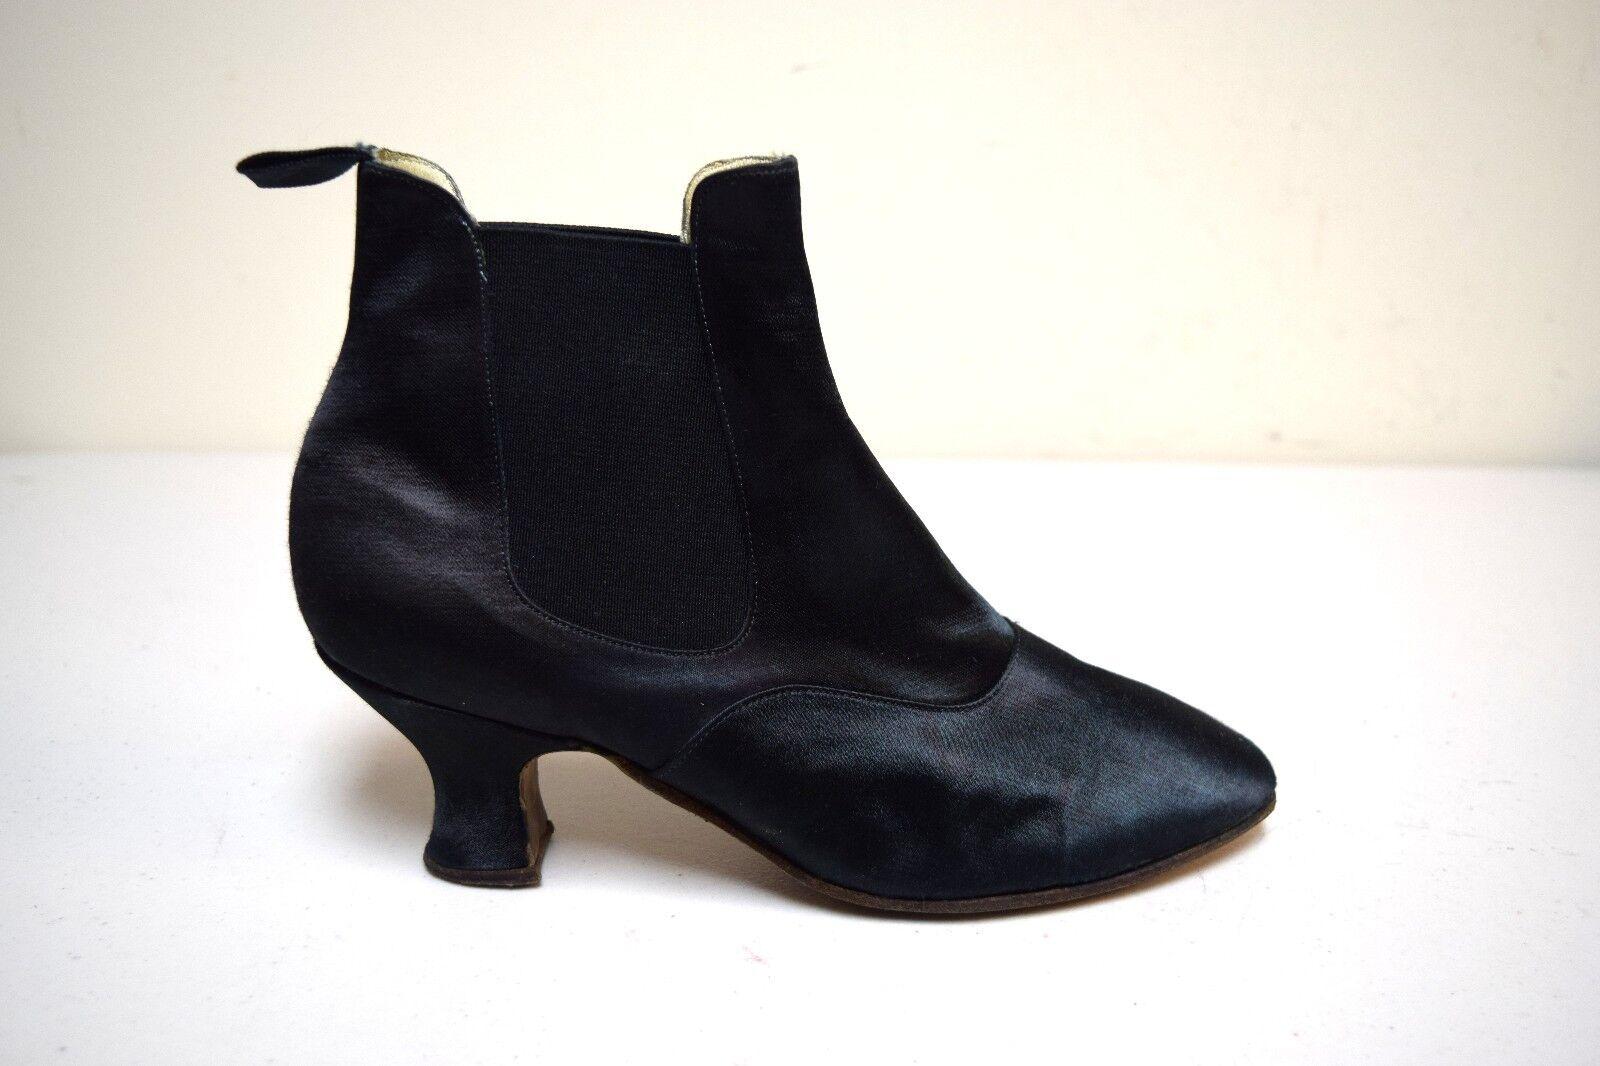 Vintage AMAZON DRY GOODS Black Satin Satin Satin Elastic Gore Ankle Boots England Size 6 501d09